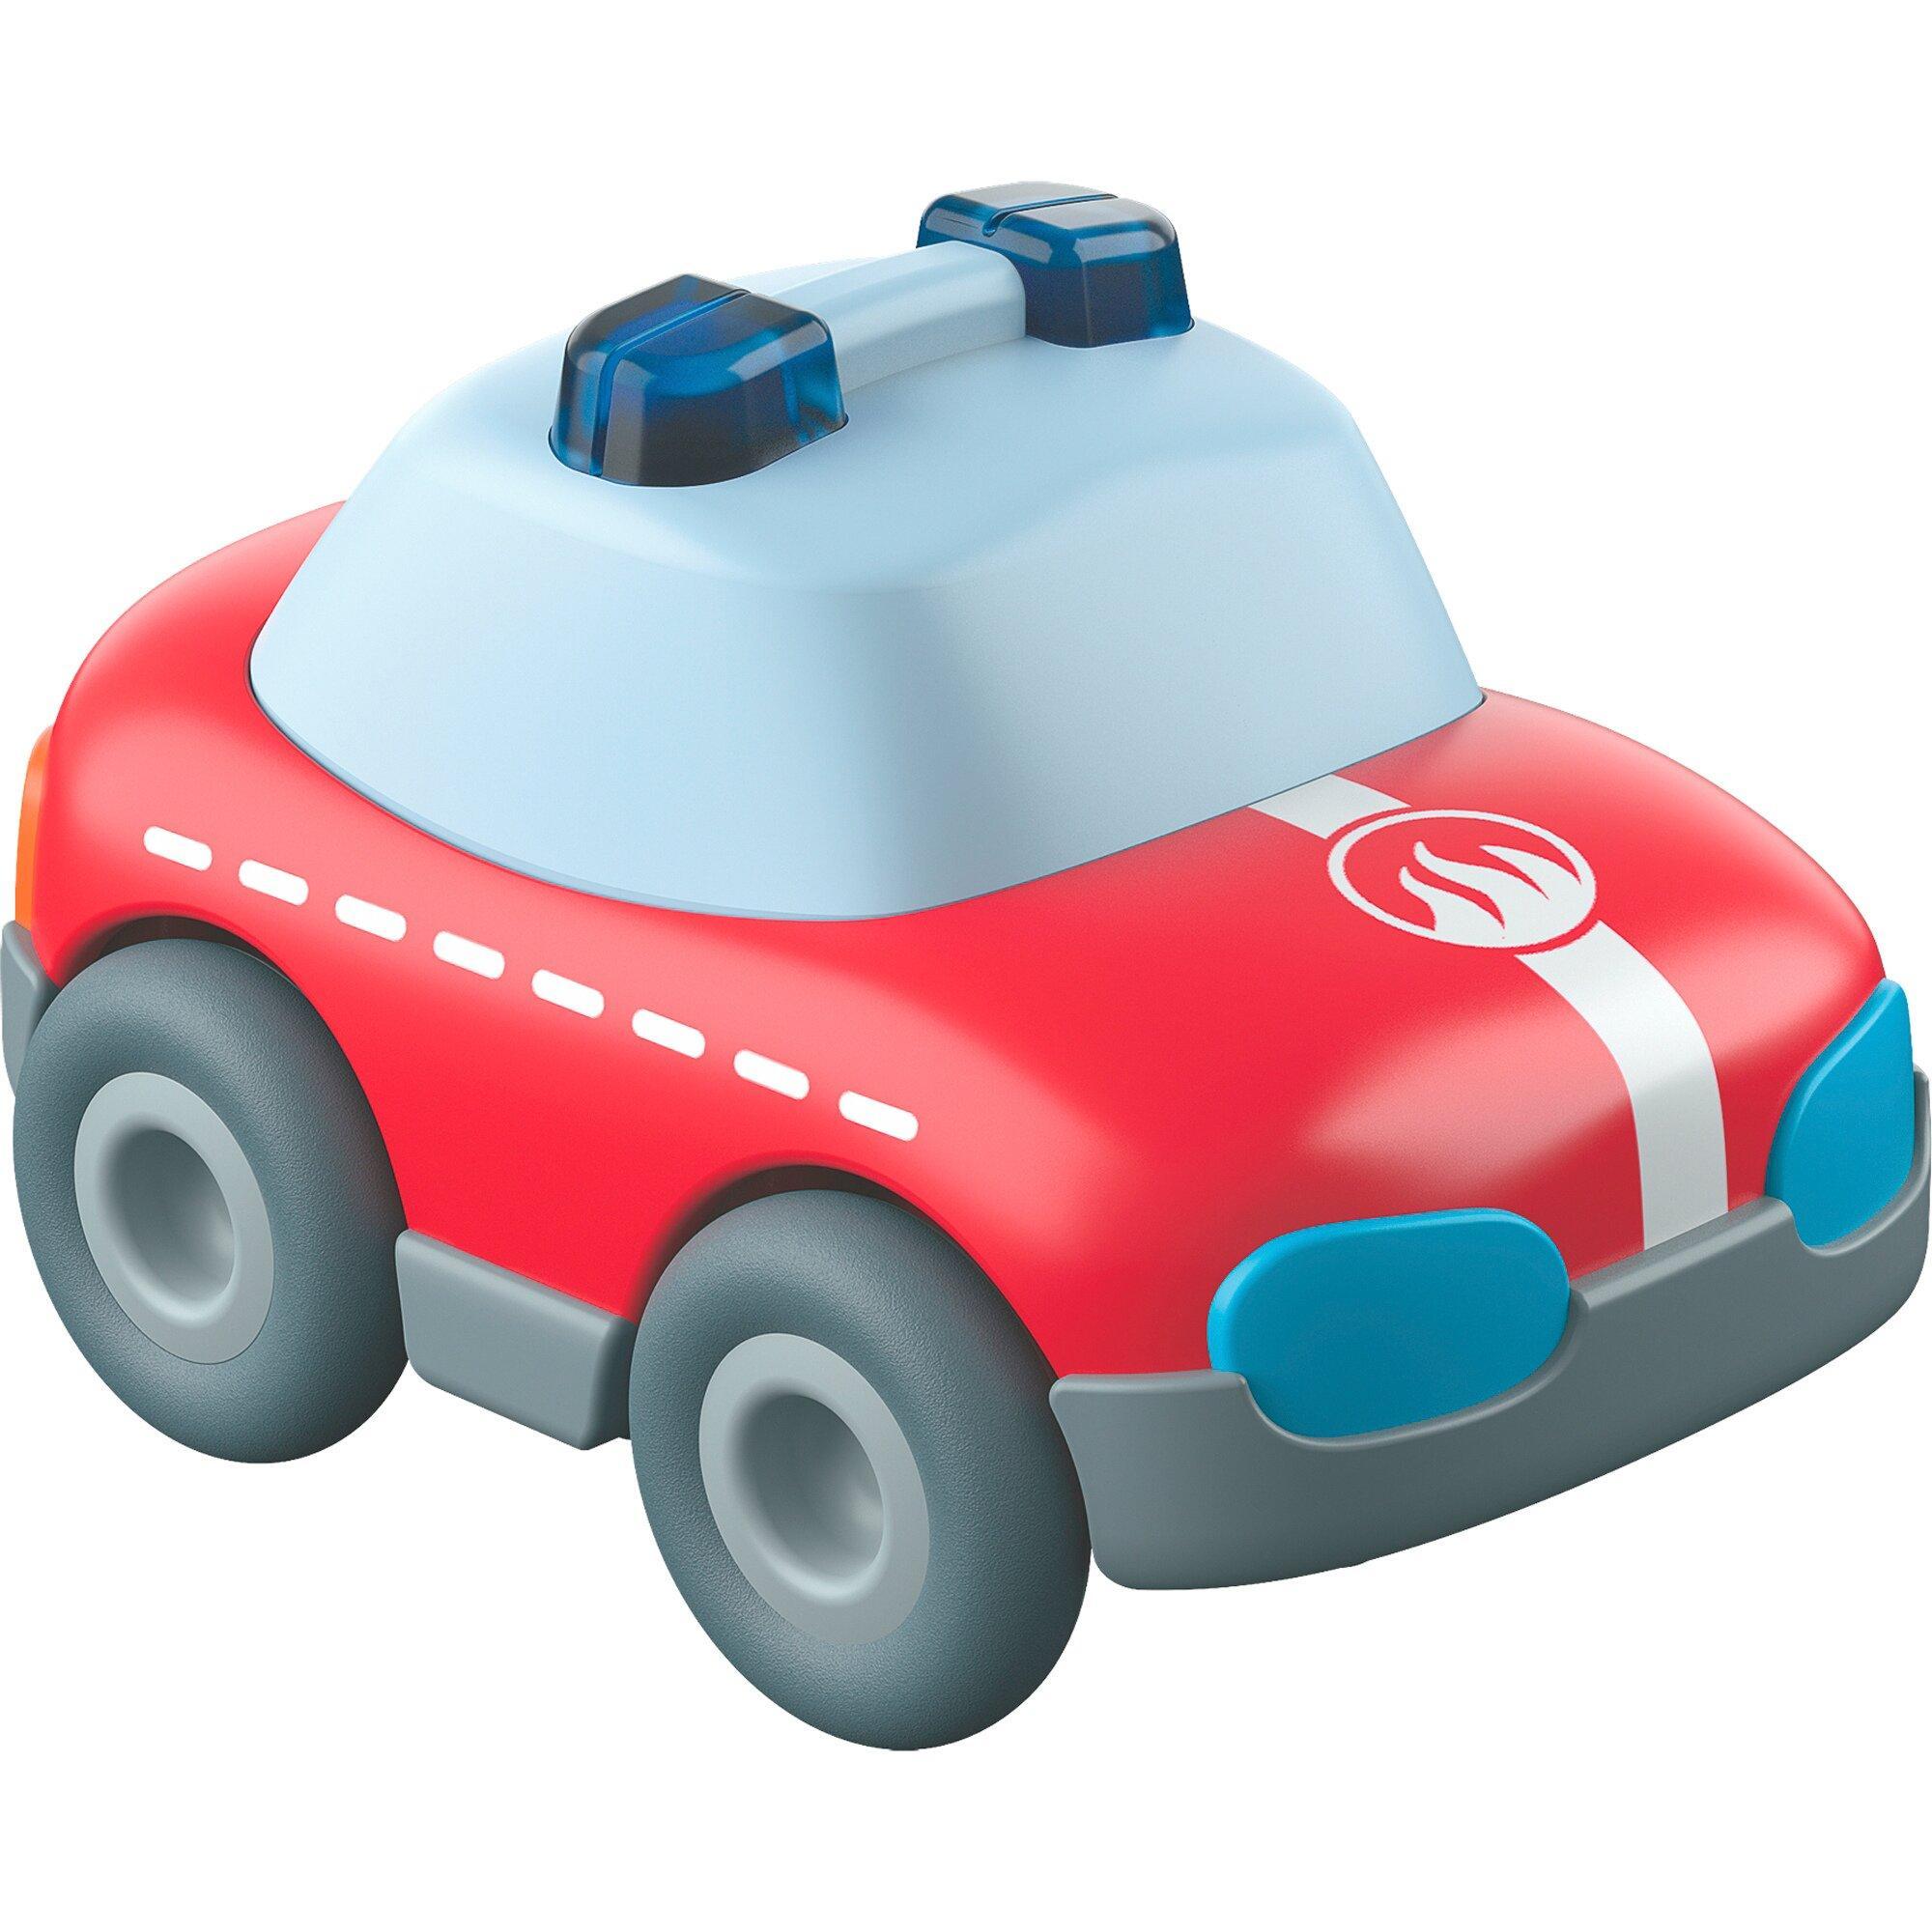 Feuerwehrauto - Kullerbü